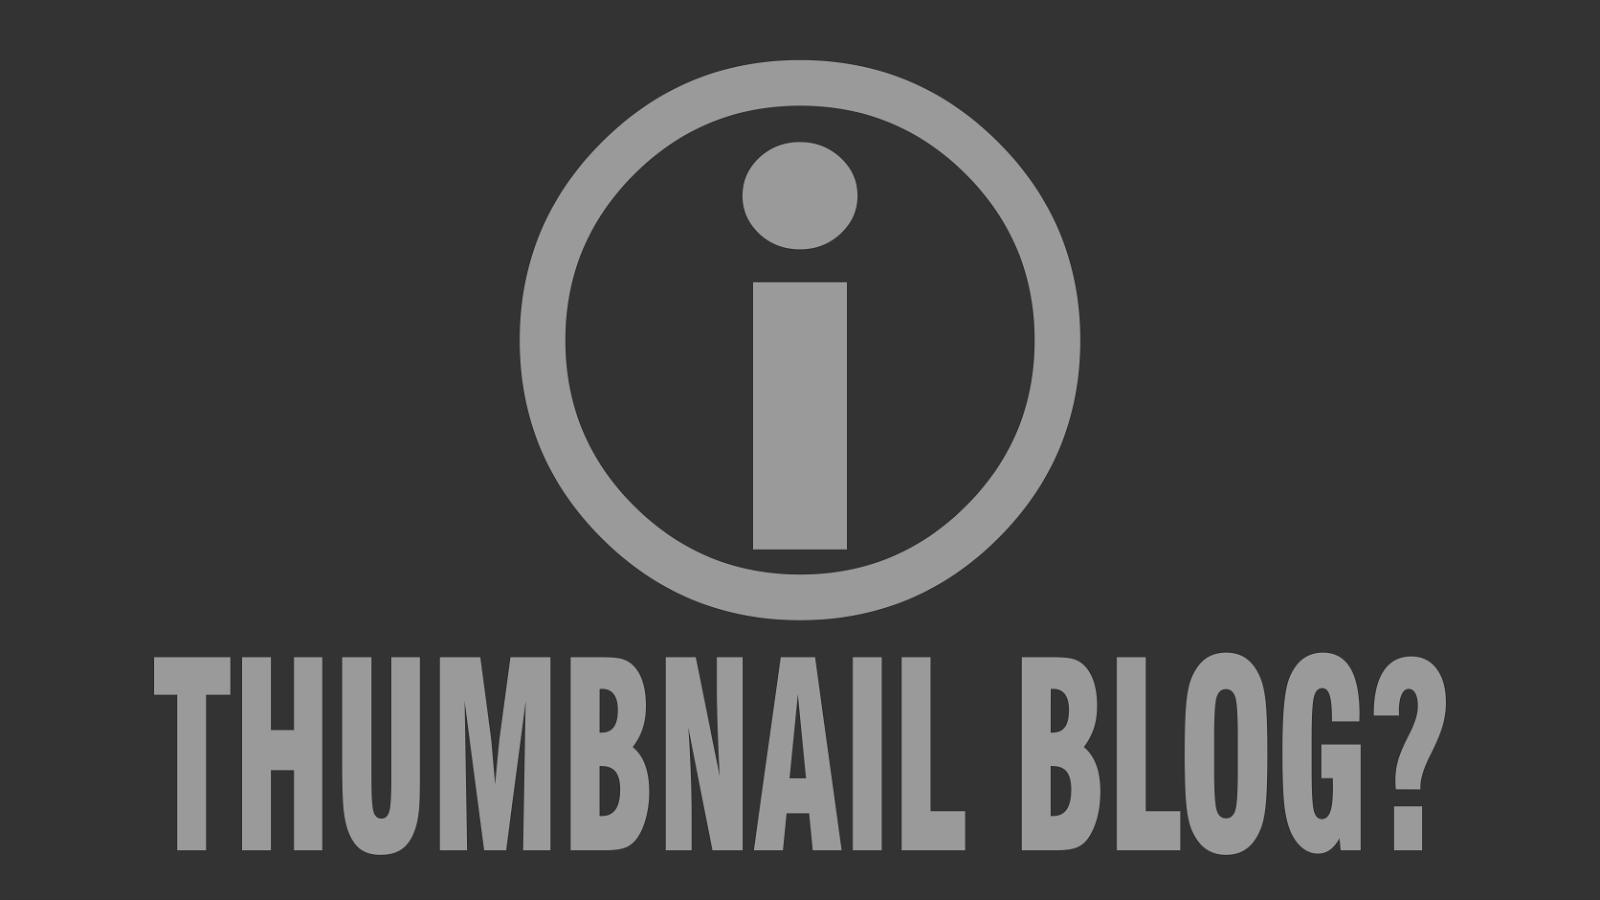 Cara mengatasi atau memperbaiki thumbnail blog yang tidak muncul